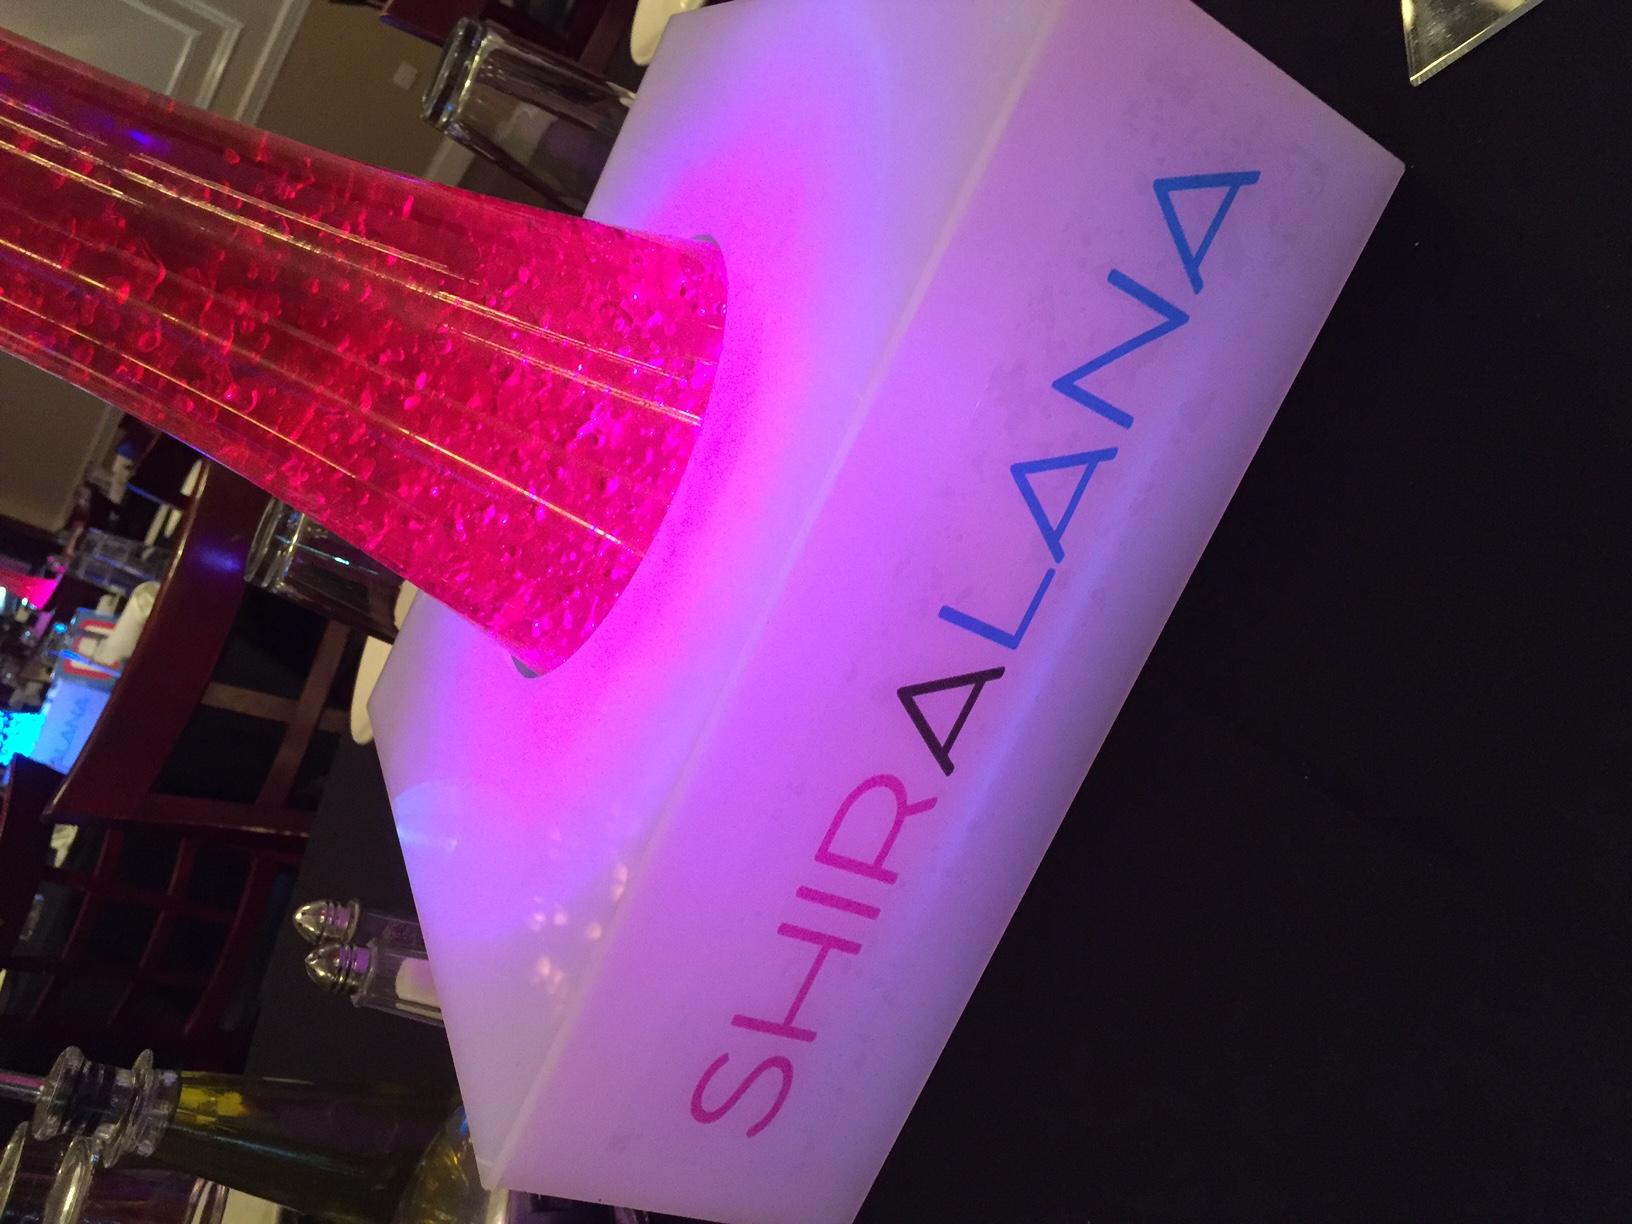 Double the fun with Shira + Alana - Kleifield Design & Associates, Inc.